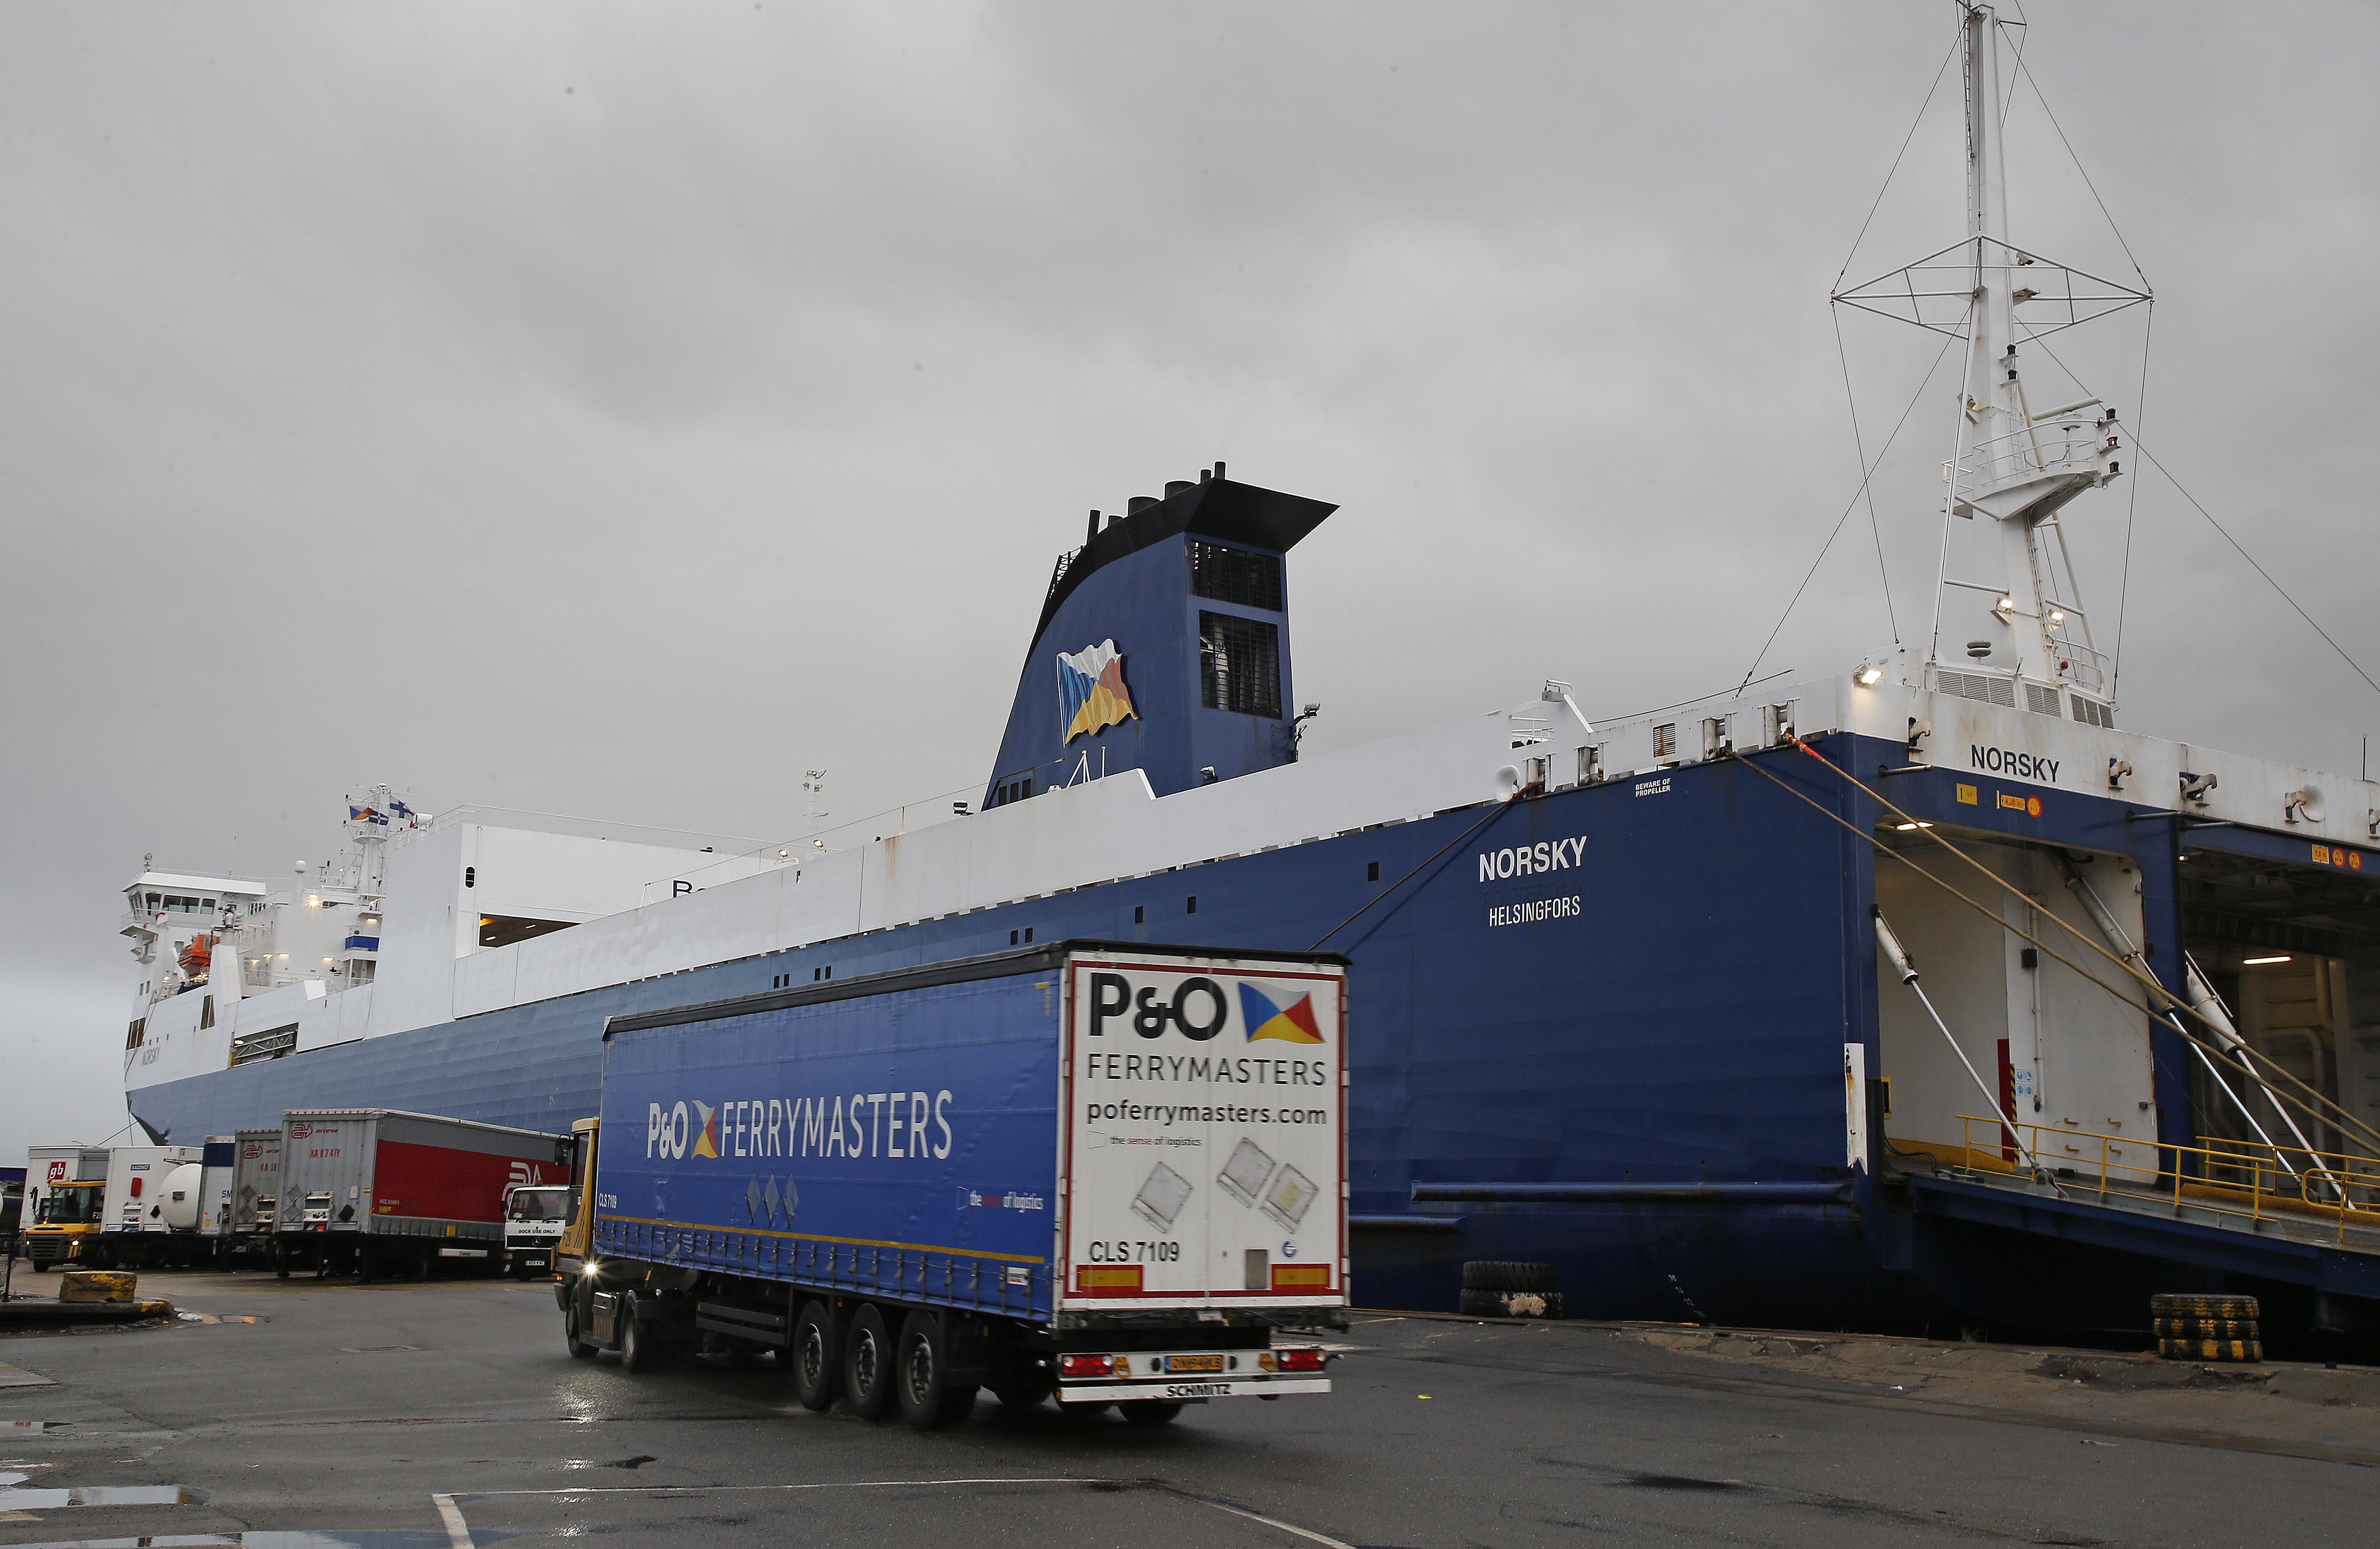 Tilbury, the P&O Ferries terminal today